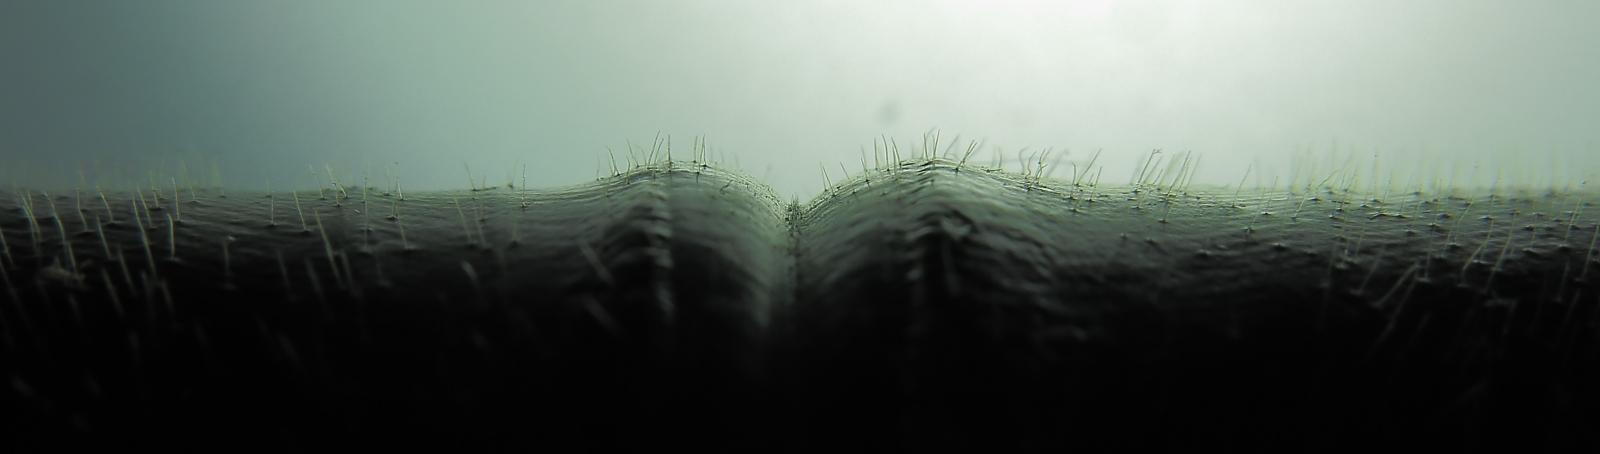 Photo# 18015 - Costus guanaiensis Siete Cataratas, upper leaf surface hairs